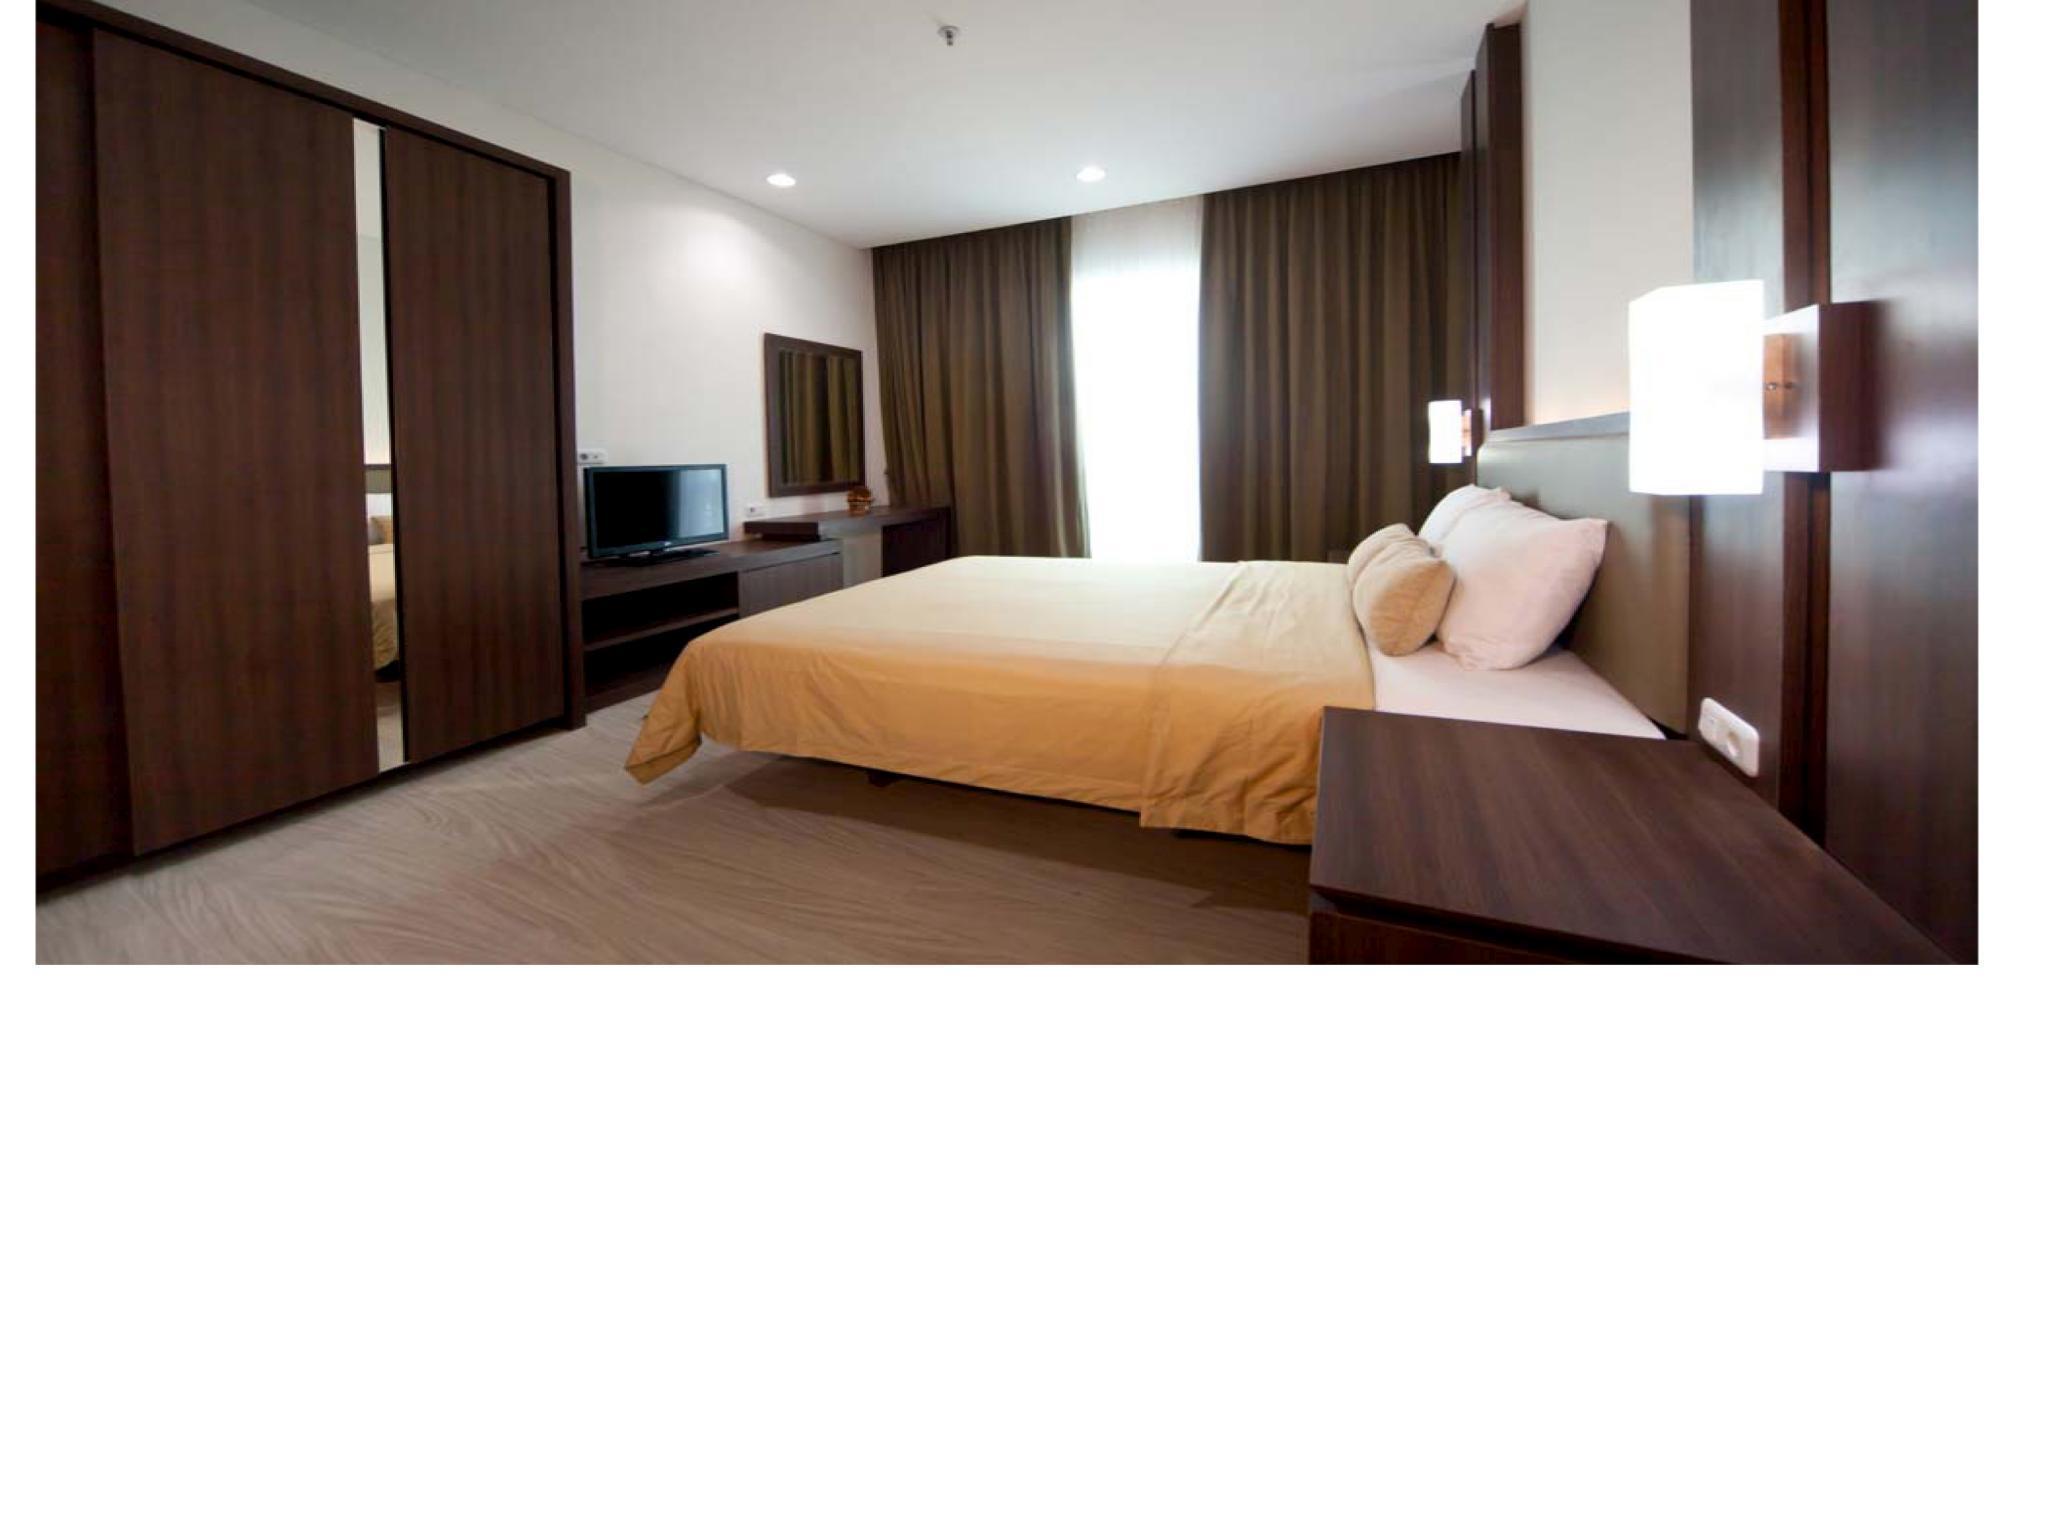 3 BR Pejaten Indah Apartment Room 03